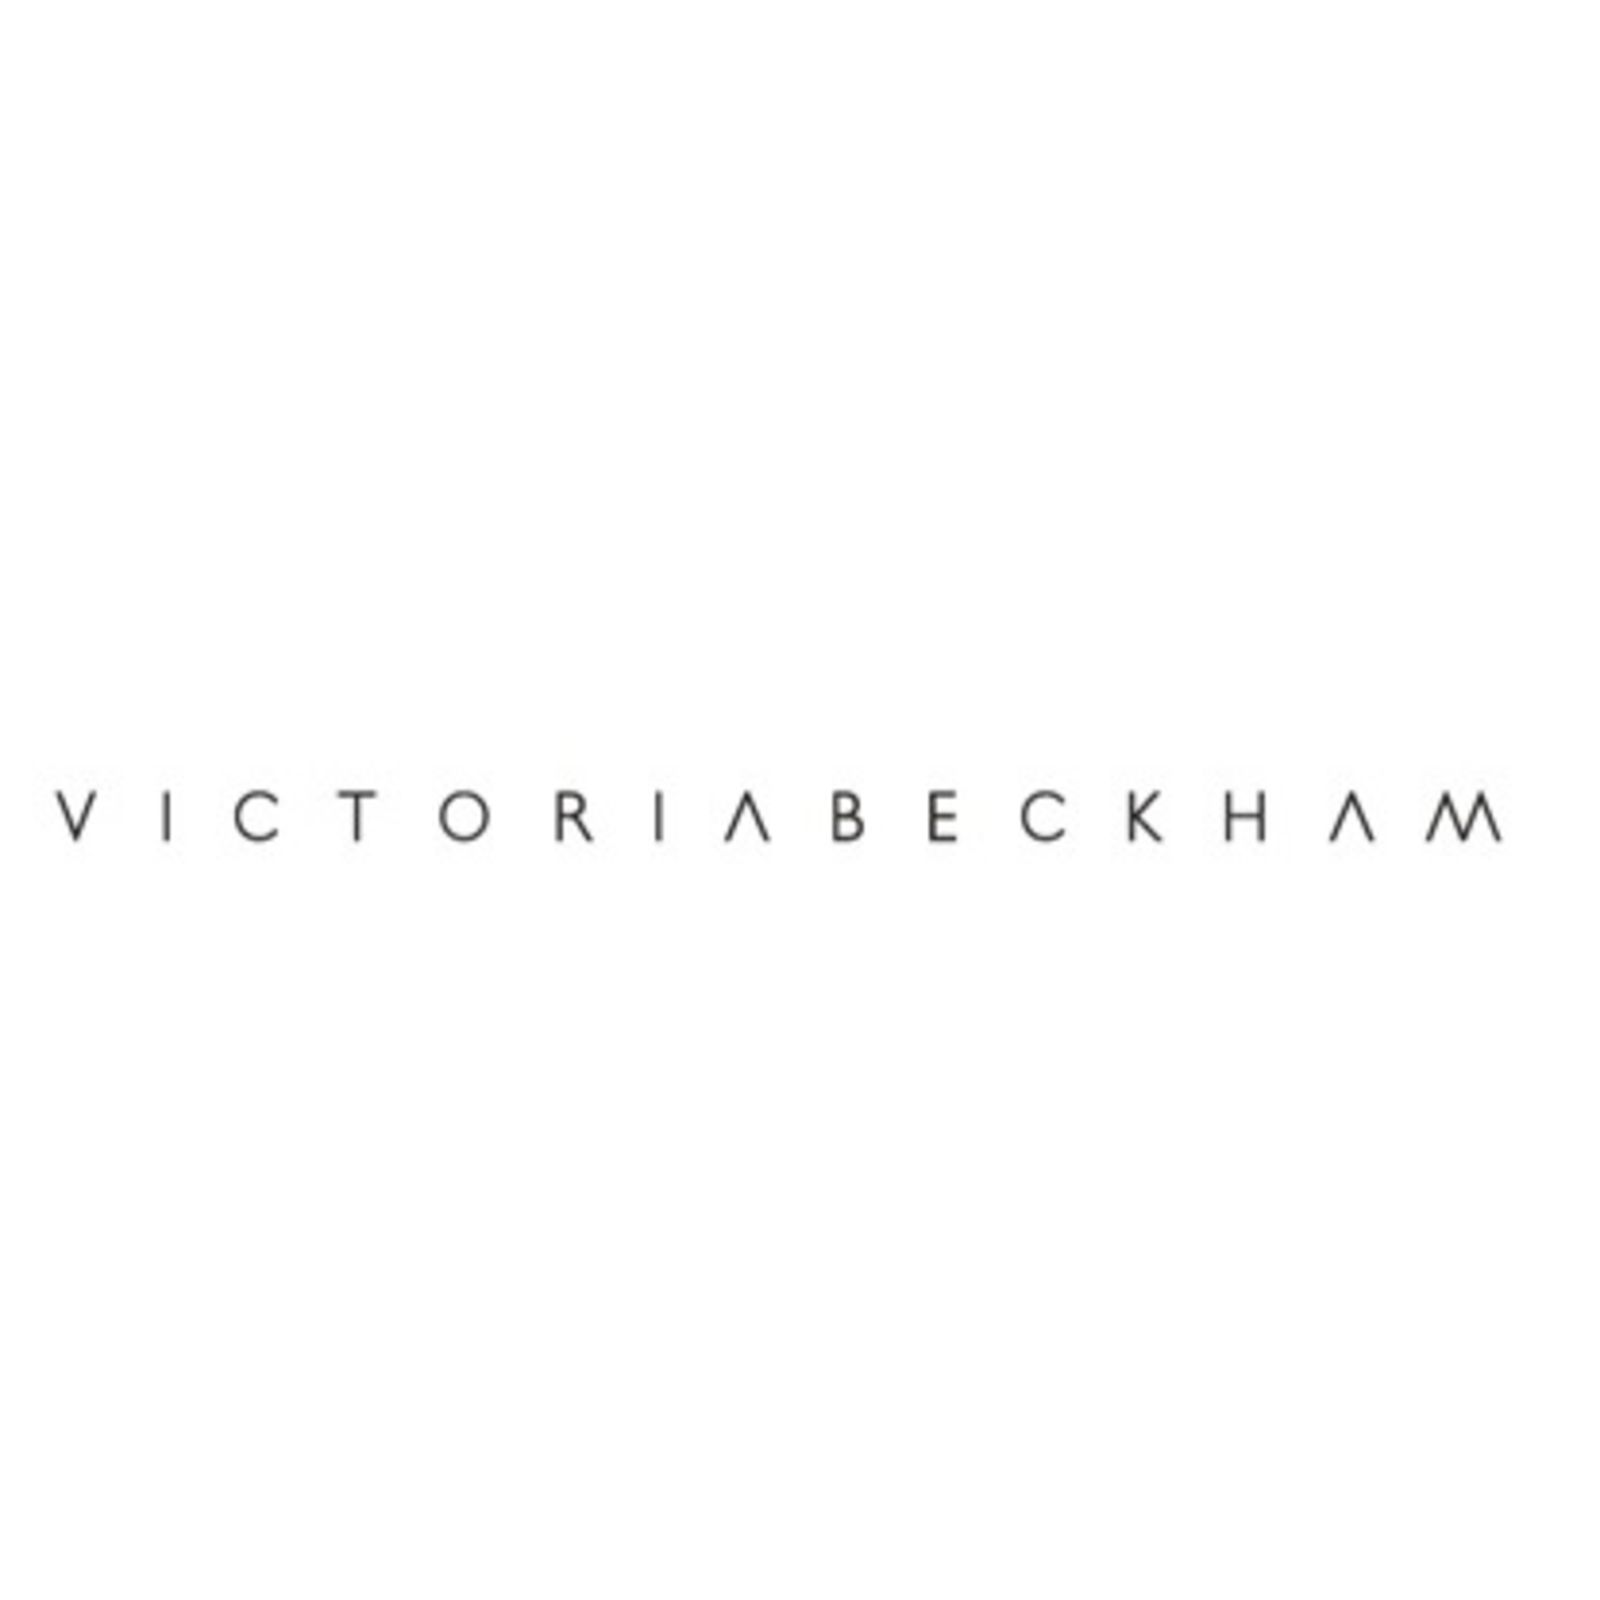 VICTORIA BECKHAM (Image 1)